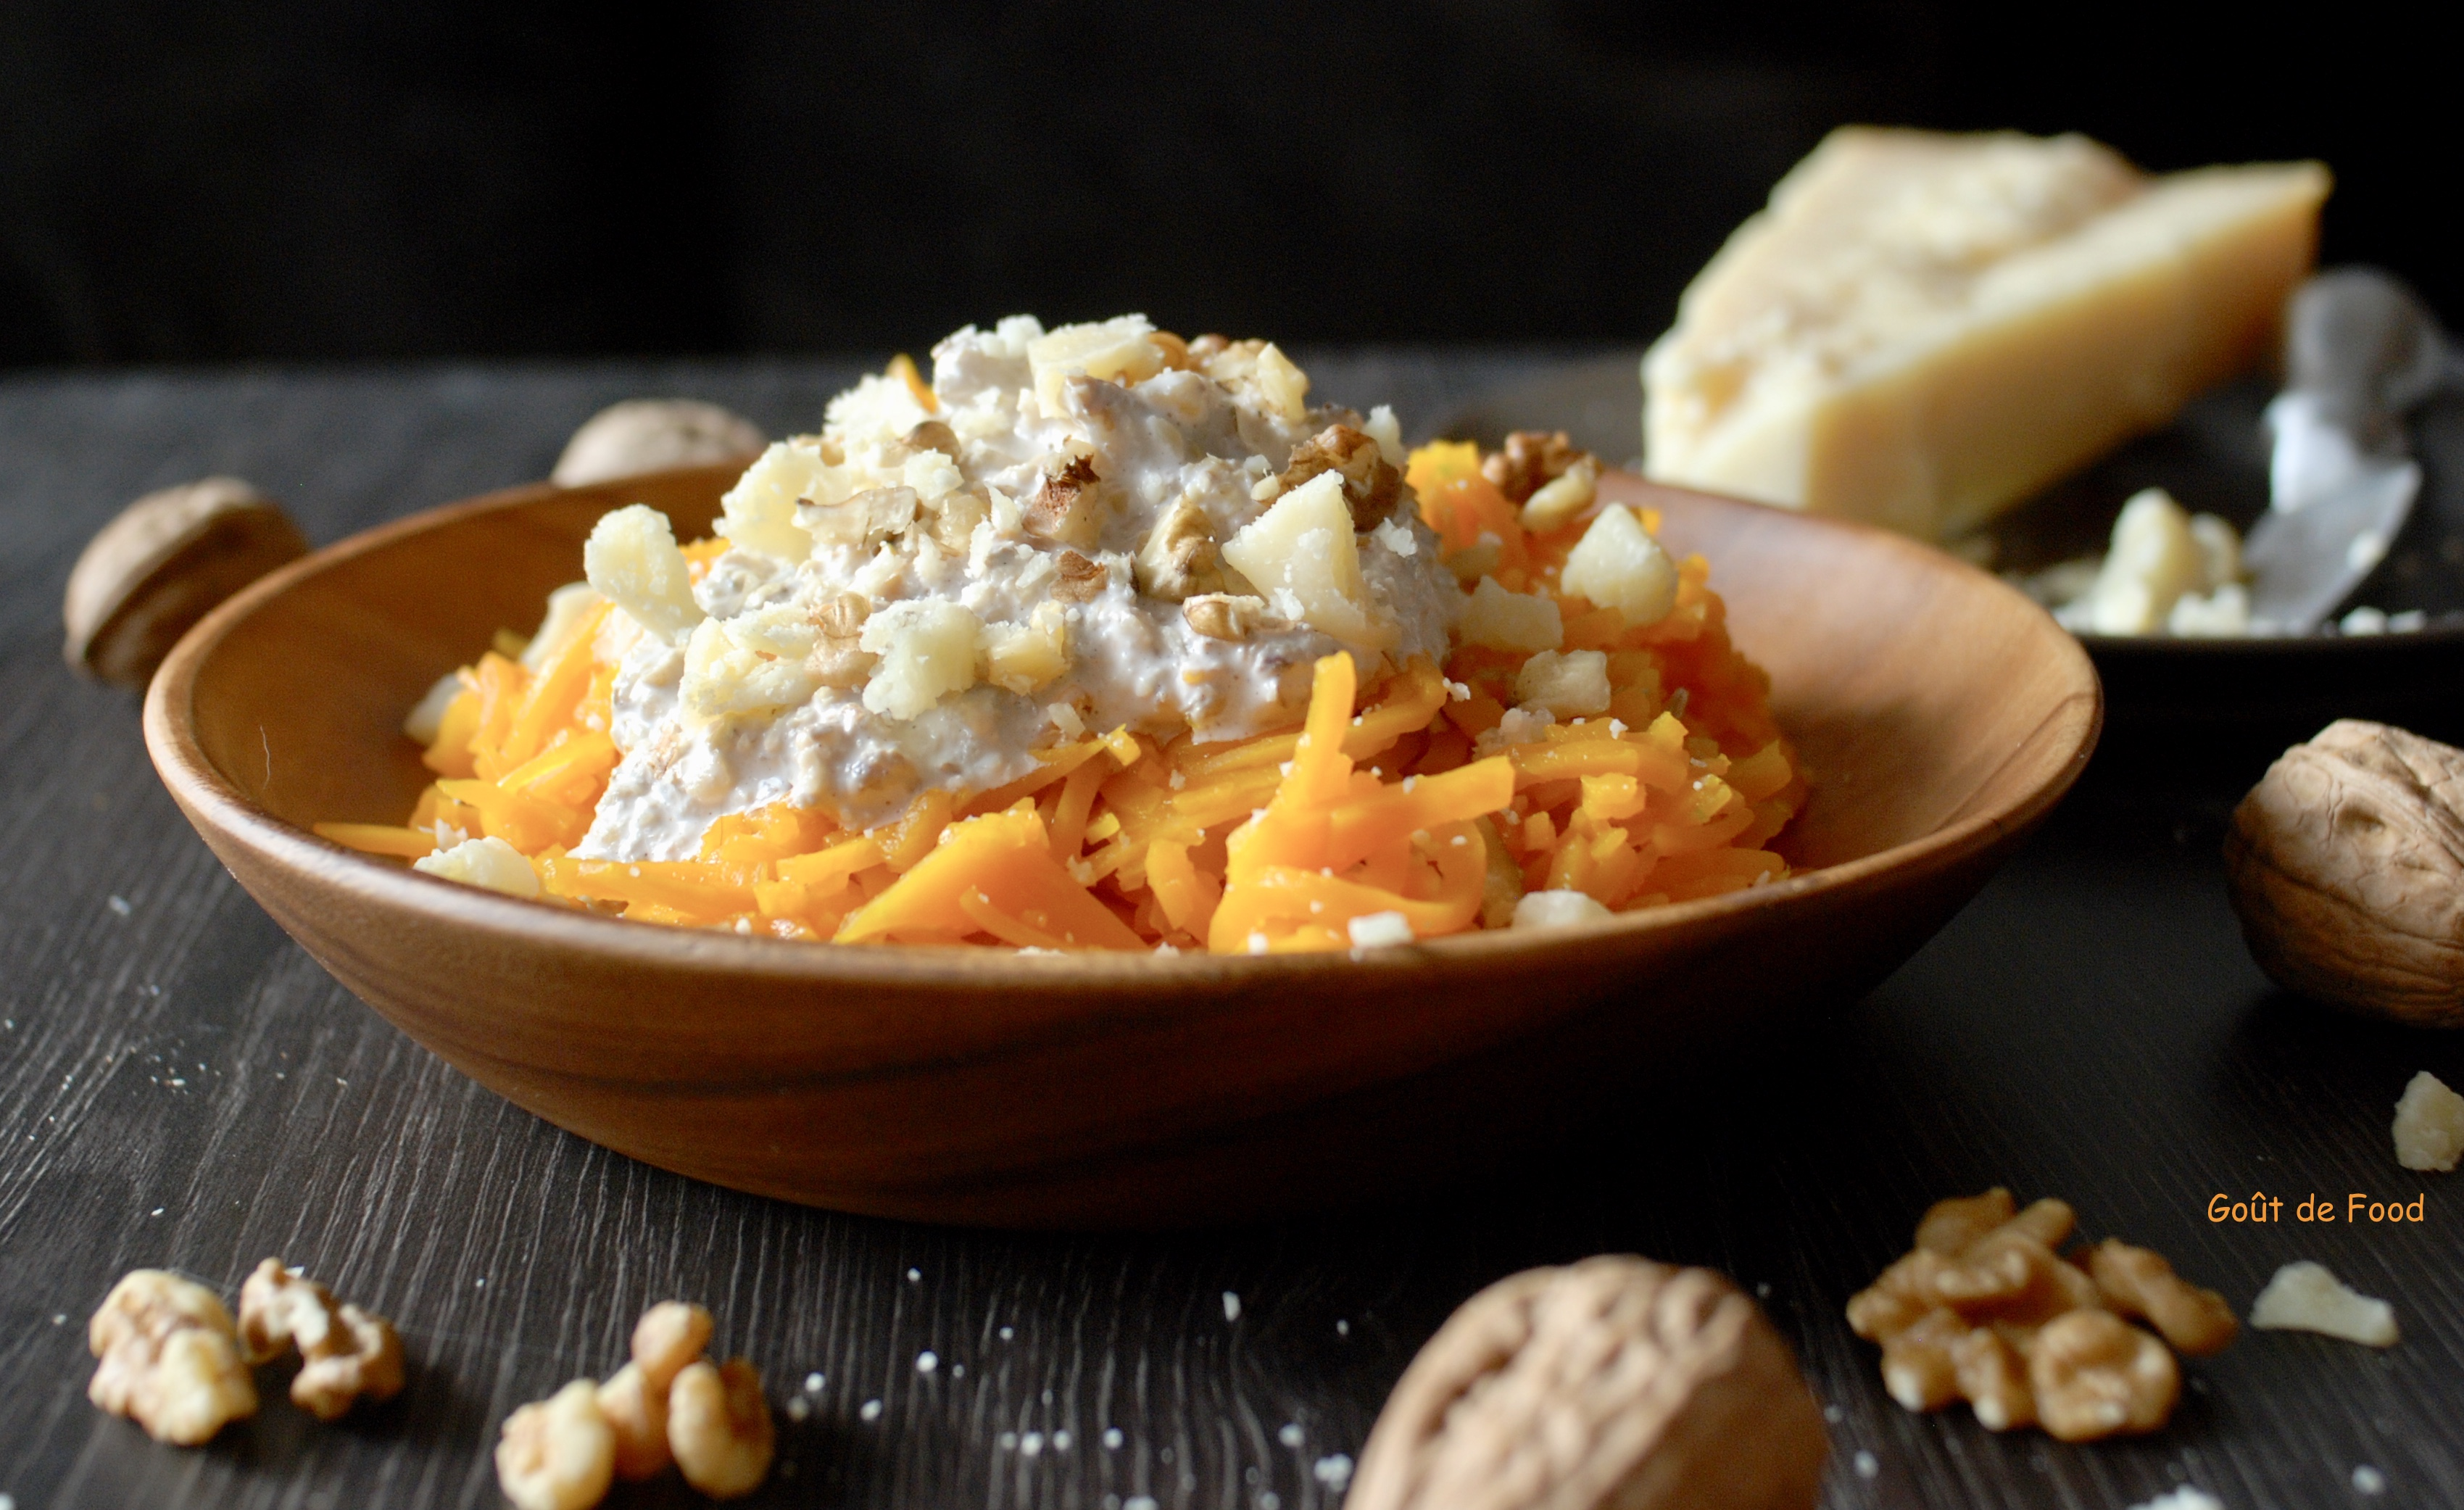 Spaghetti de Butternut à la crème de noix et grana padano